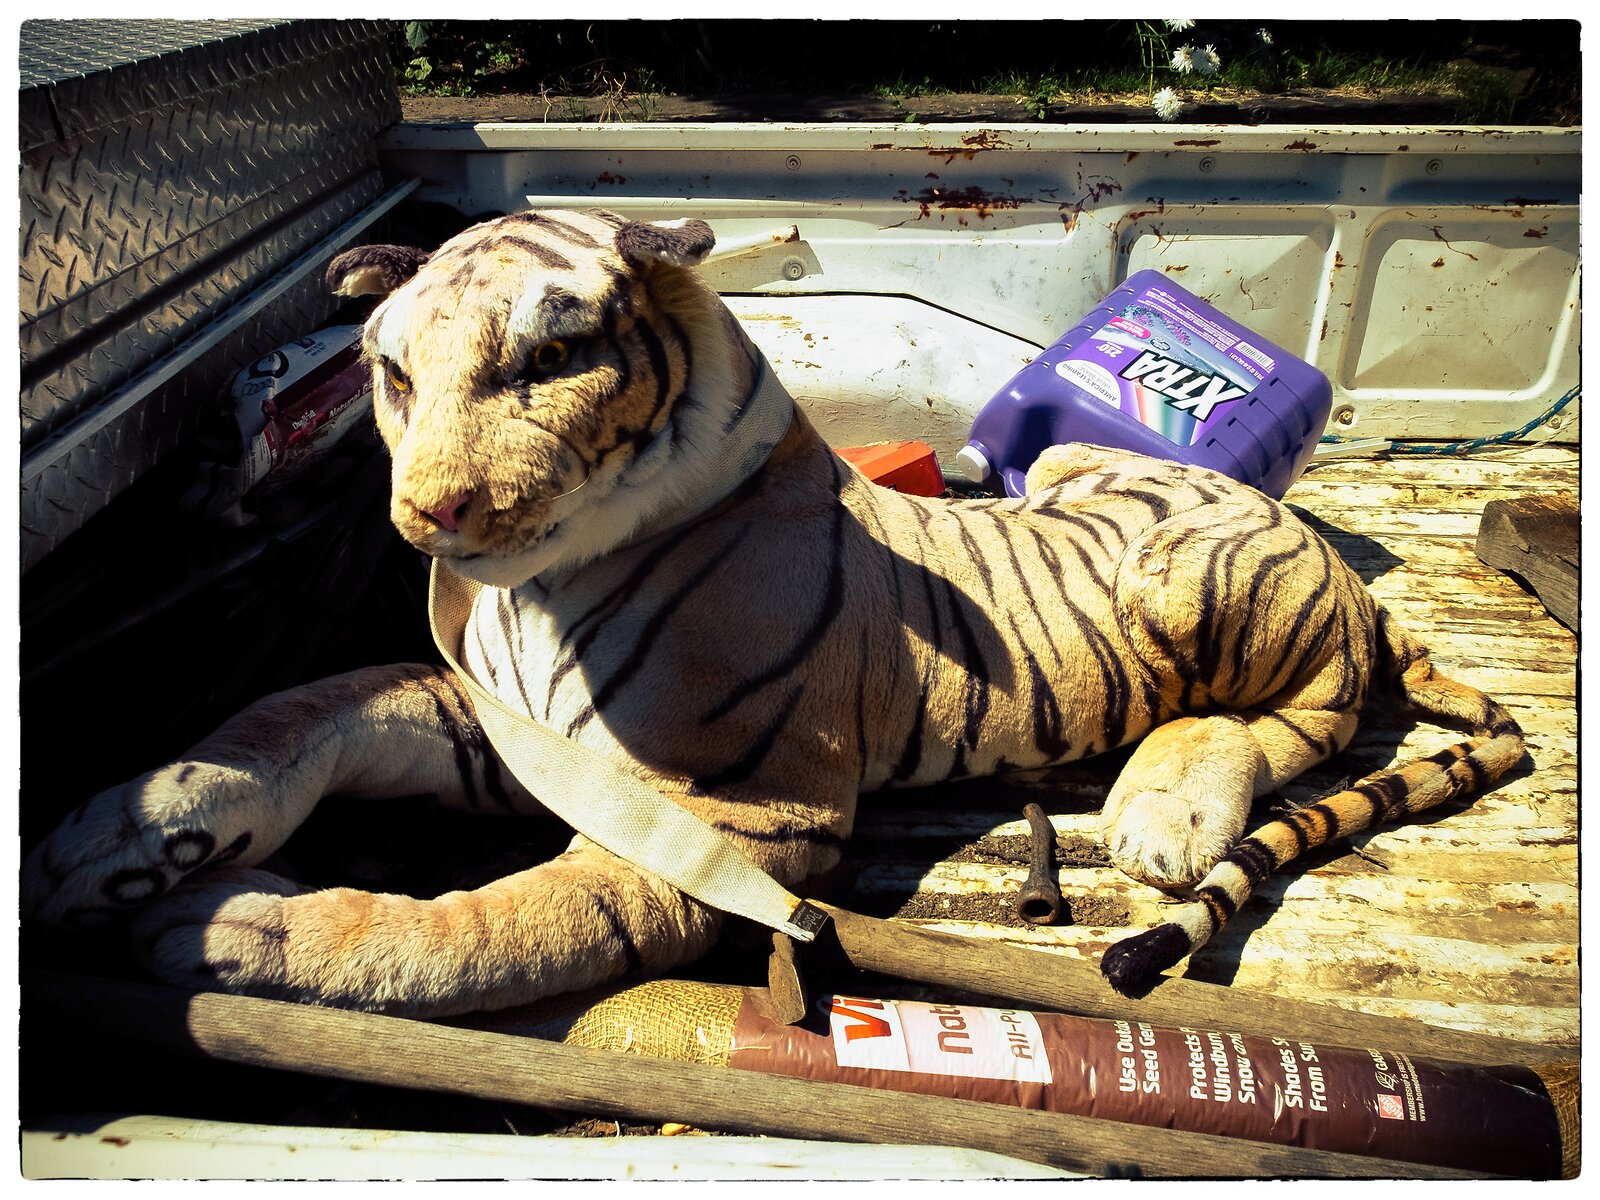 X30_July10_Pickup_Tiger(EkLomoWarm).jpg